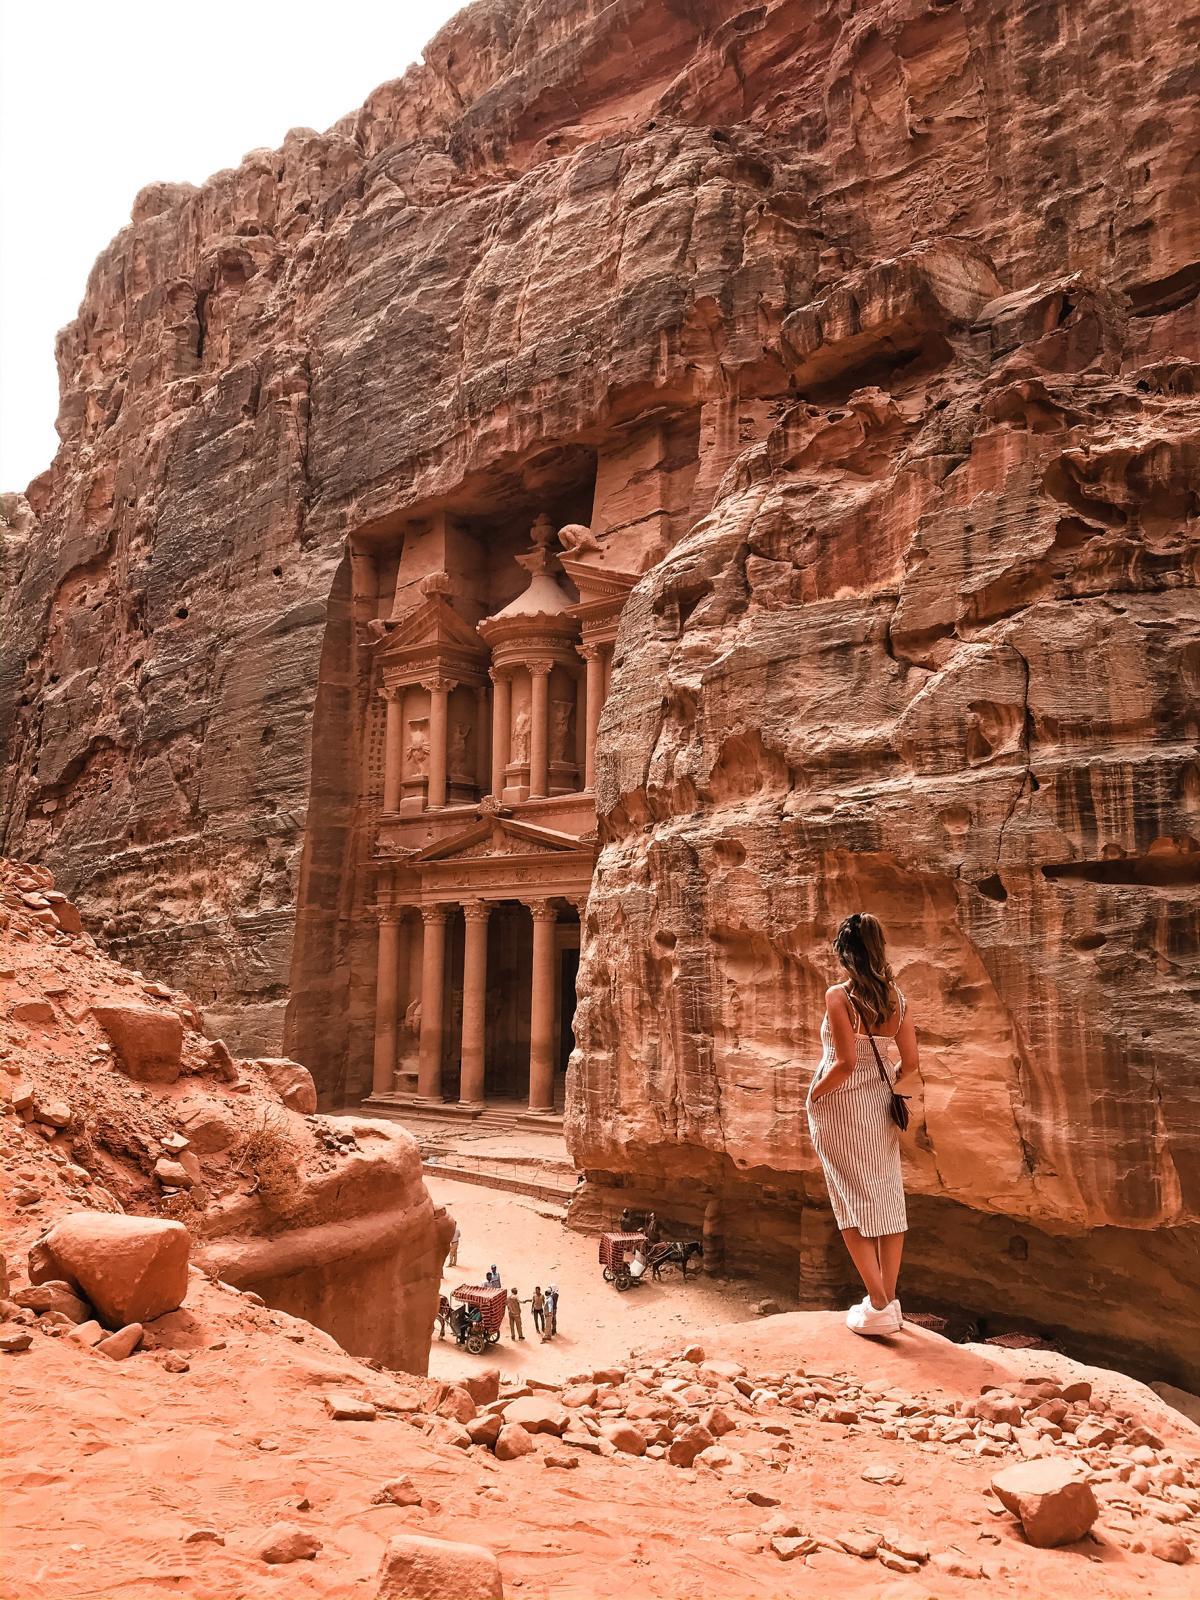 Petra - UNESCO-Weltkulturerbe und Weltwunder der Moderne